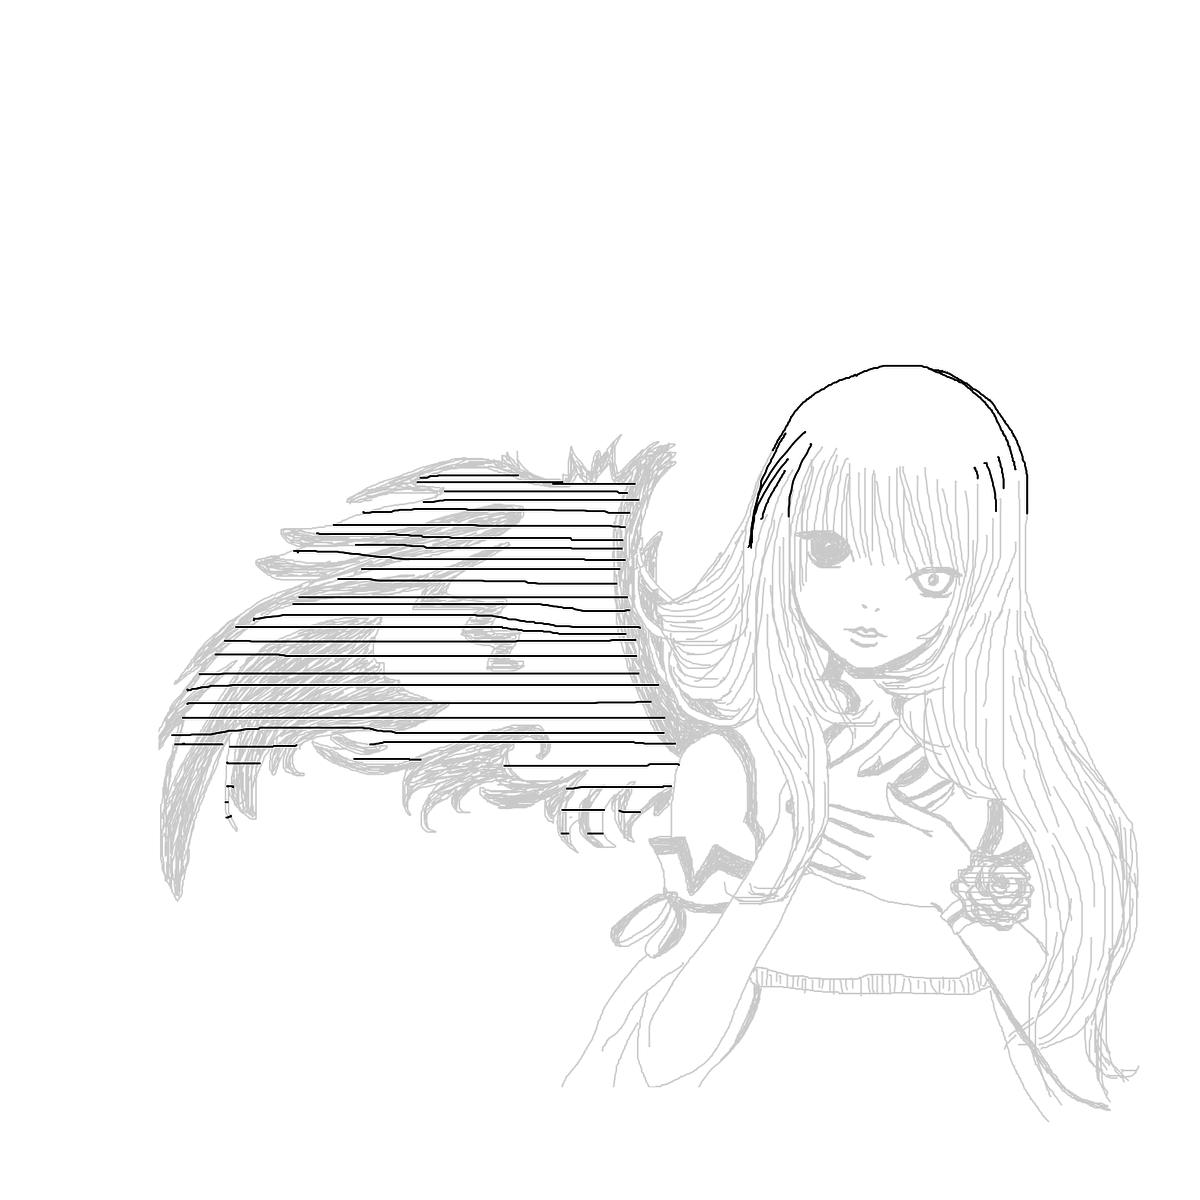 BAAAM drawing#23444 lat:45.7347679138183600lng: 4.9028878211975100